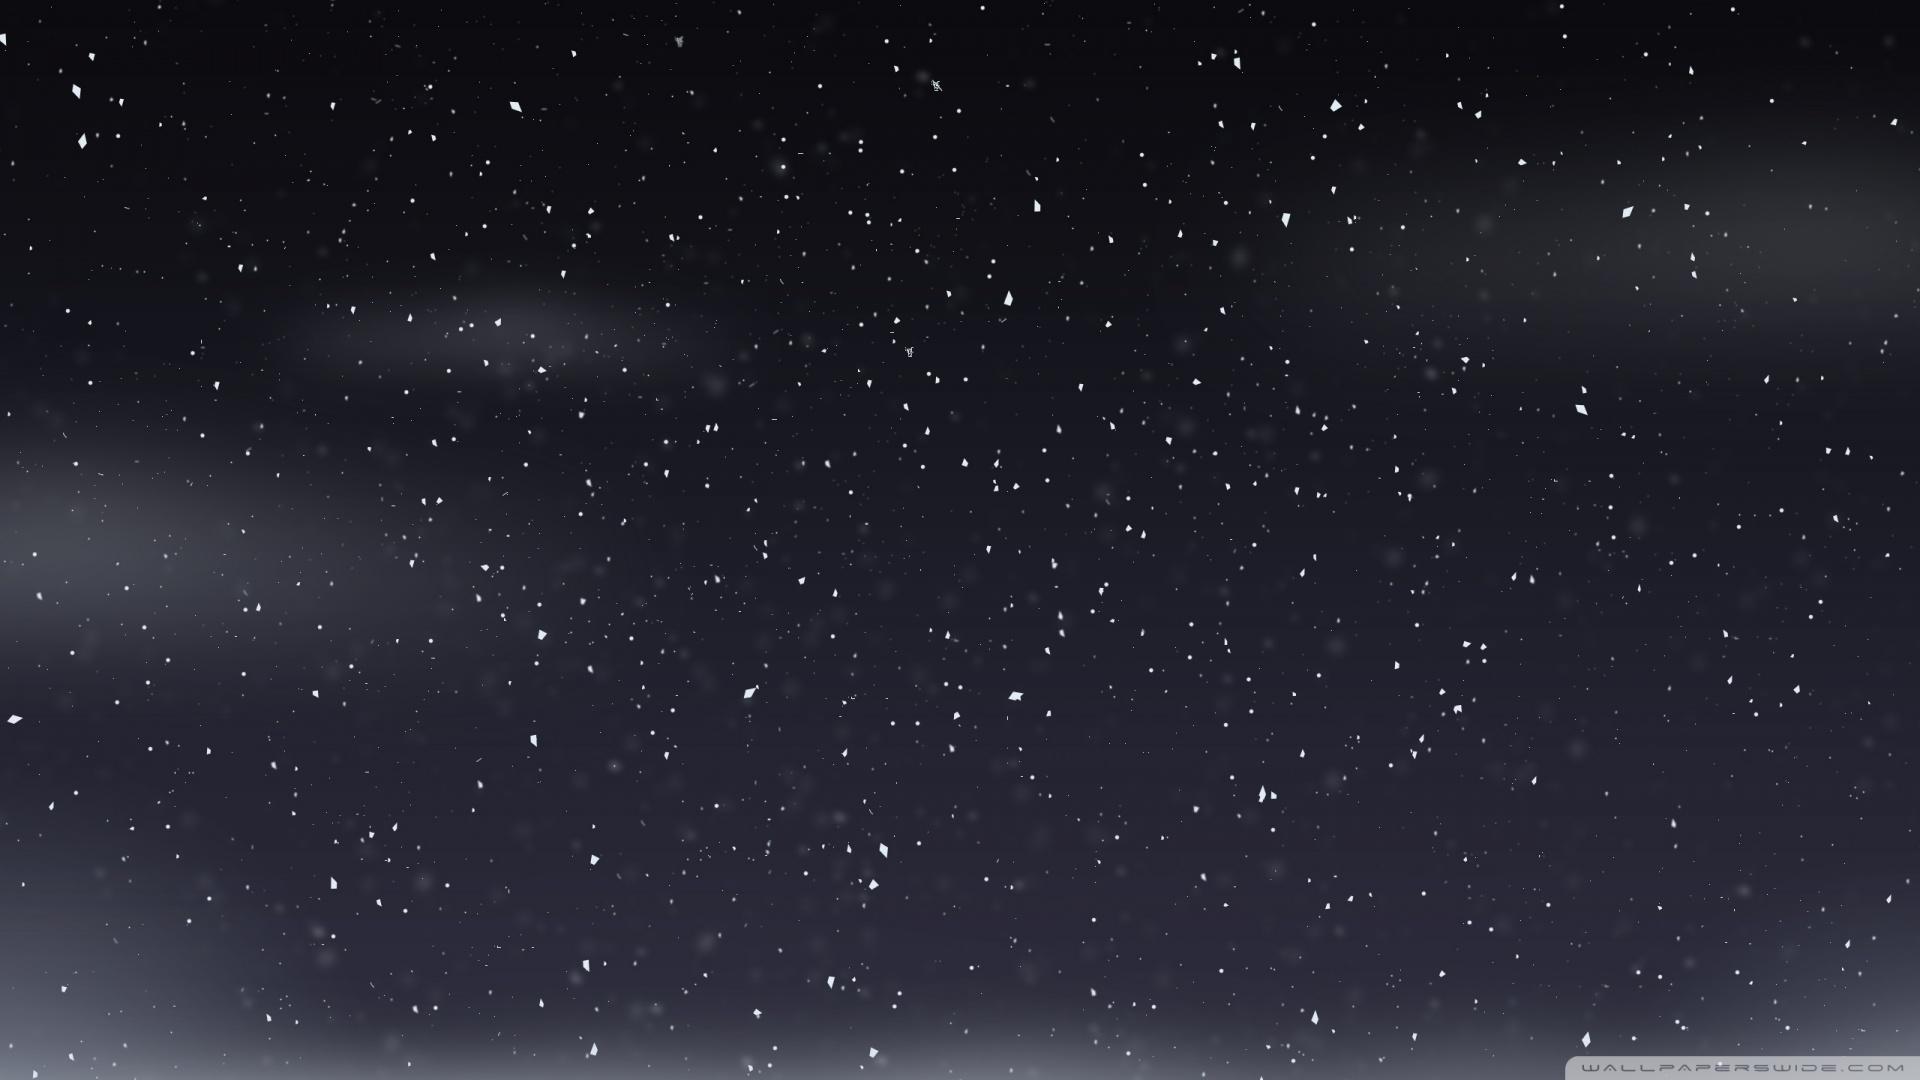 Iphone 5 Falling Snow Wallpaper Snowfall 4k Hd Desktop Wallpaper For 4k Ultra Hd Tv